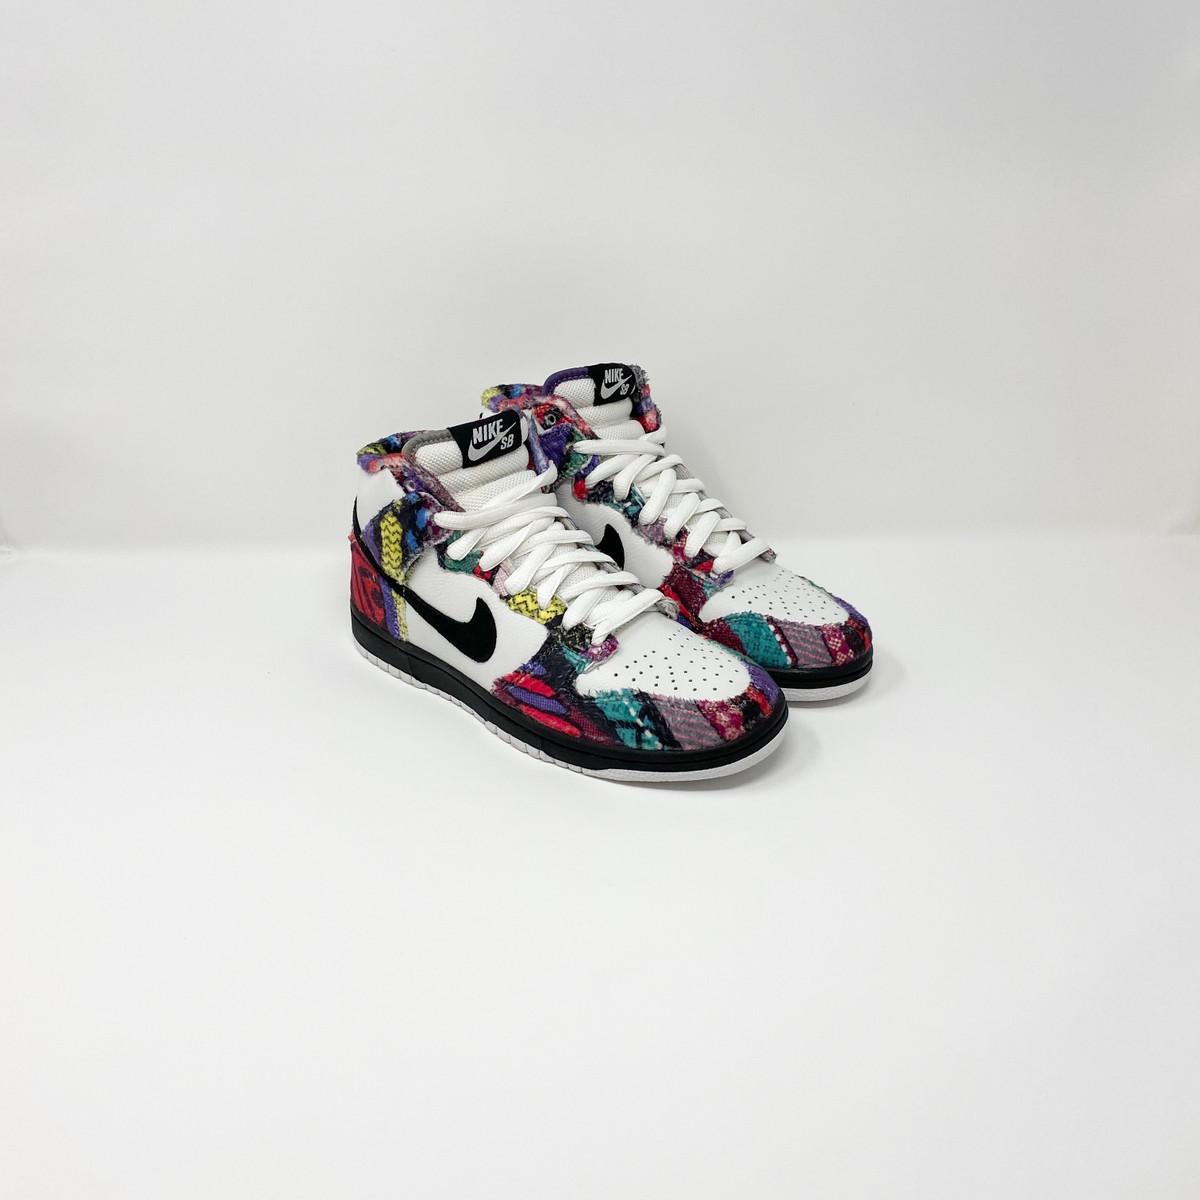 Nike Dunk Hi Prem SB Huxtable